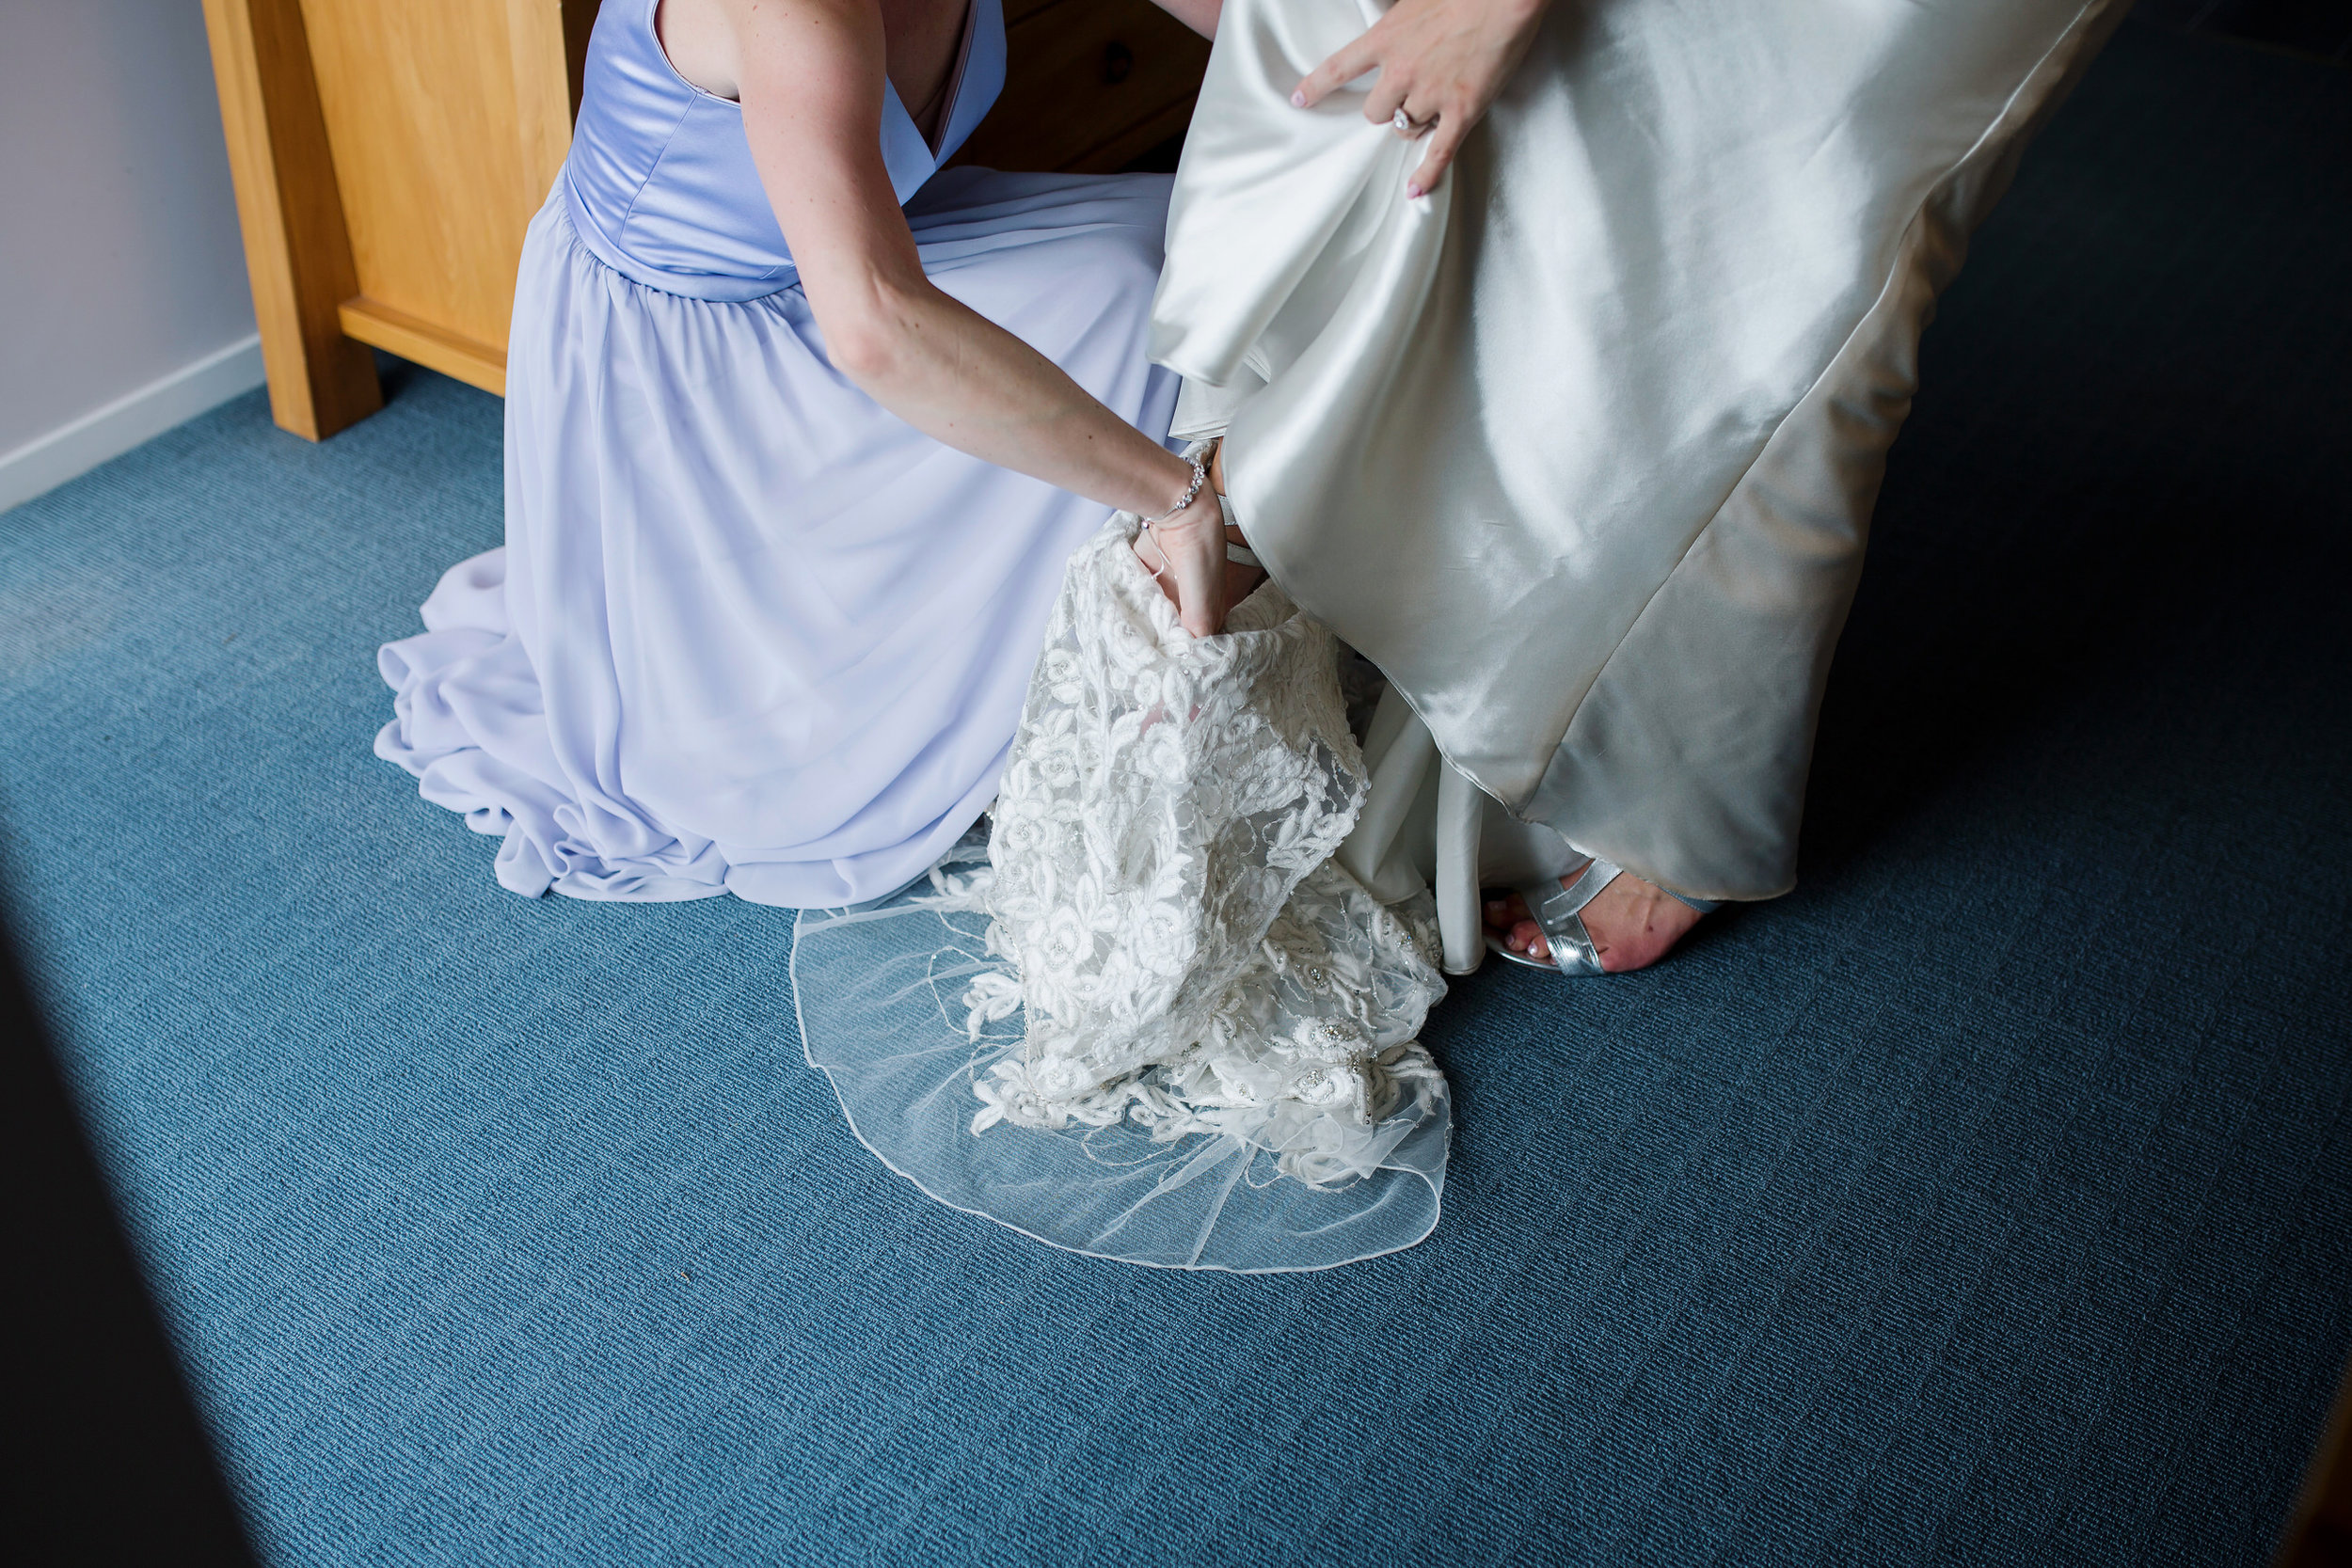 Martinborough-Poppies-Wedding-Caine-Eloise-Toni-Larsen-0020.jpg